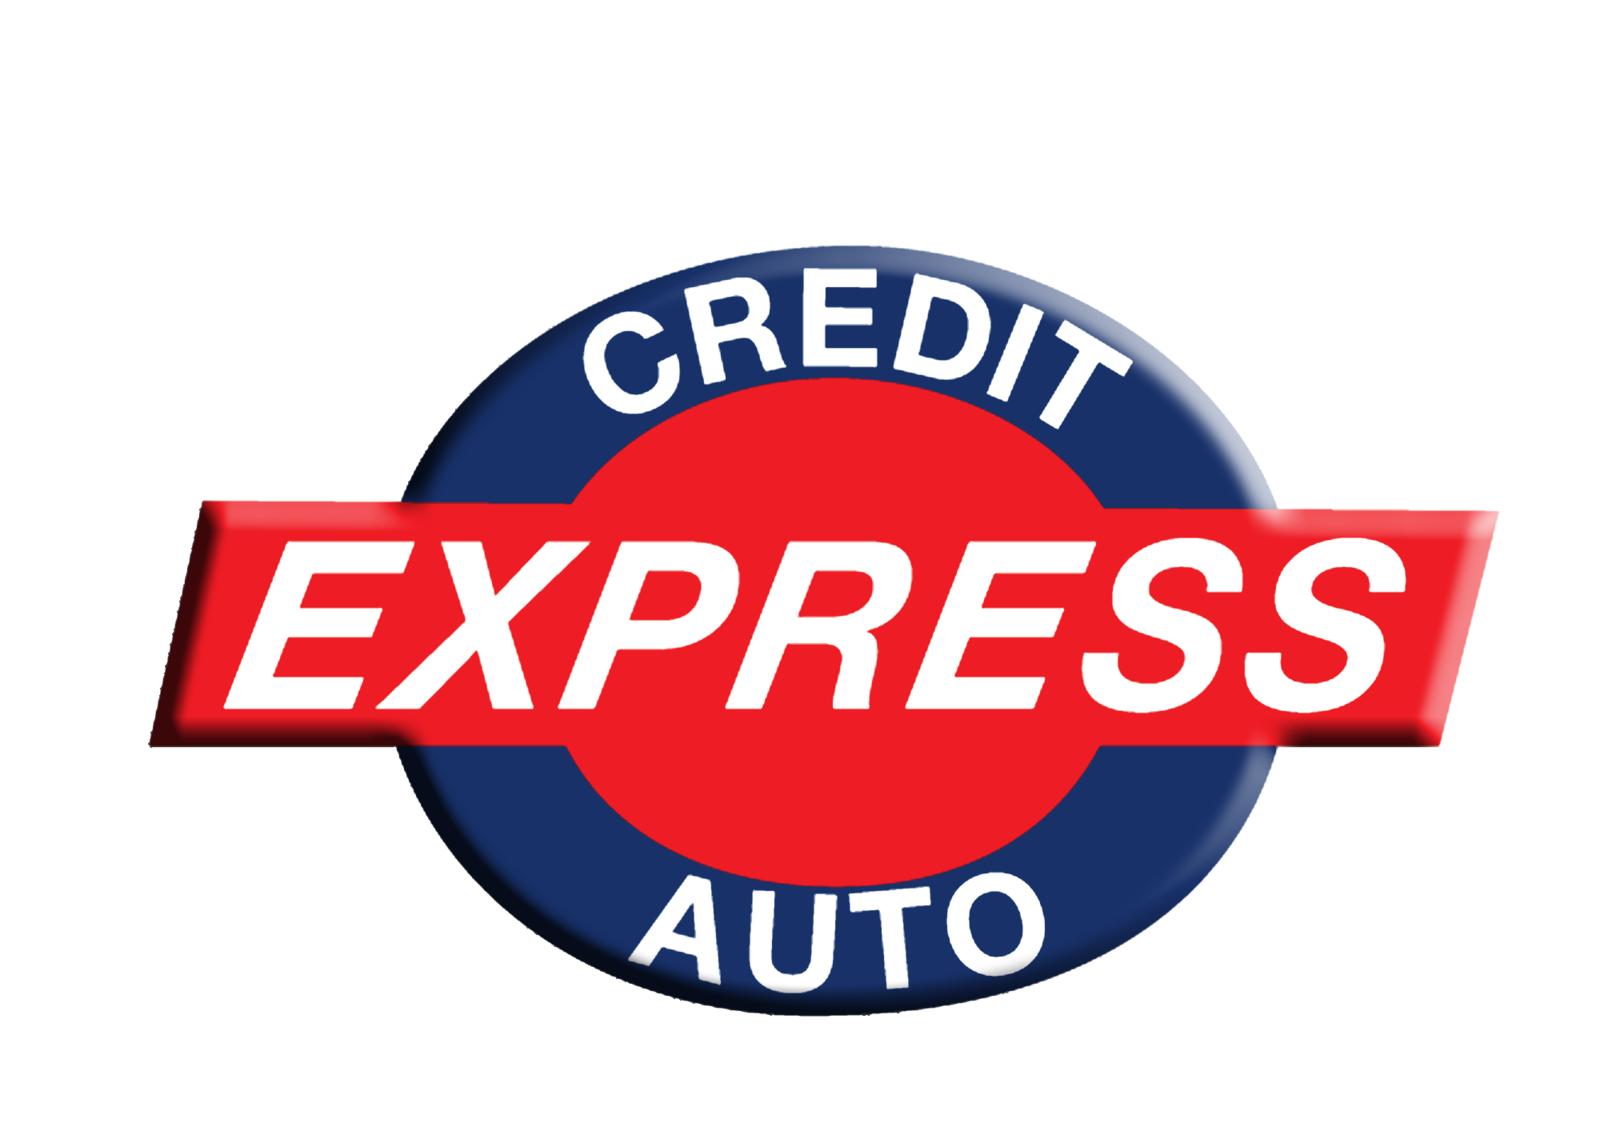 Express Credit Auto - 5 locations in Oklahoma City, Tulsa ...